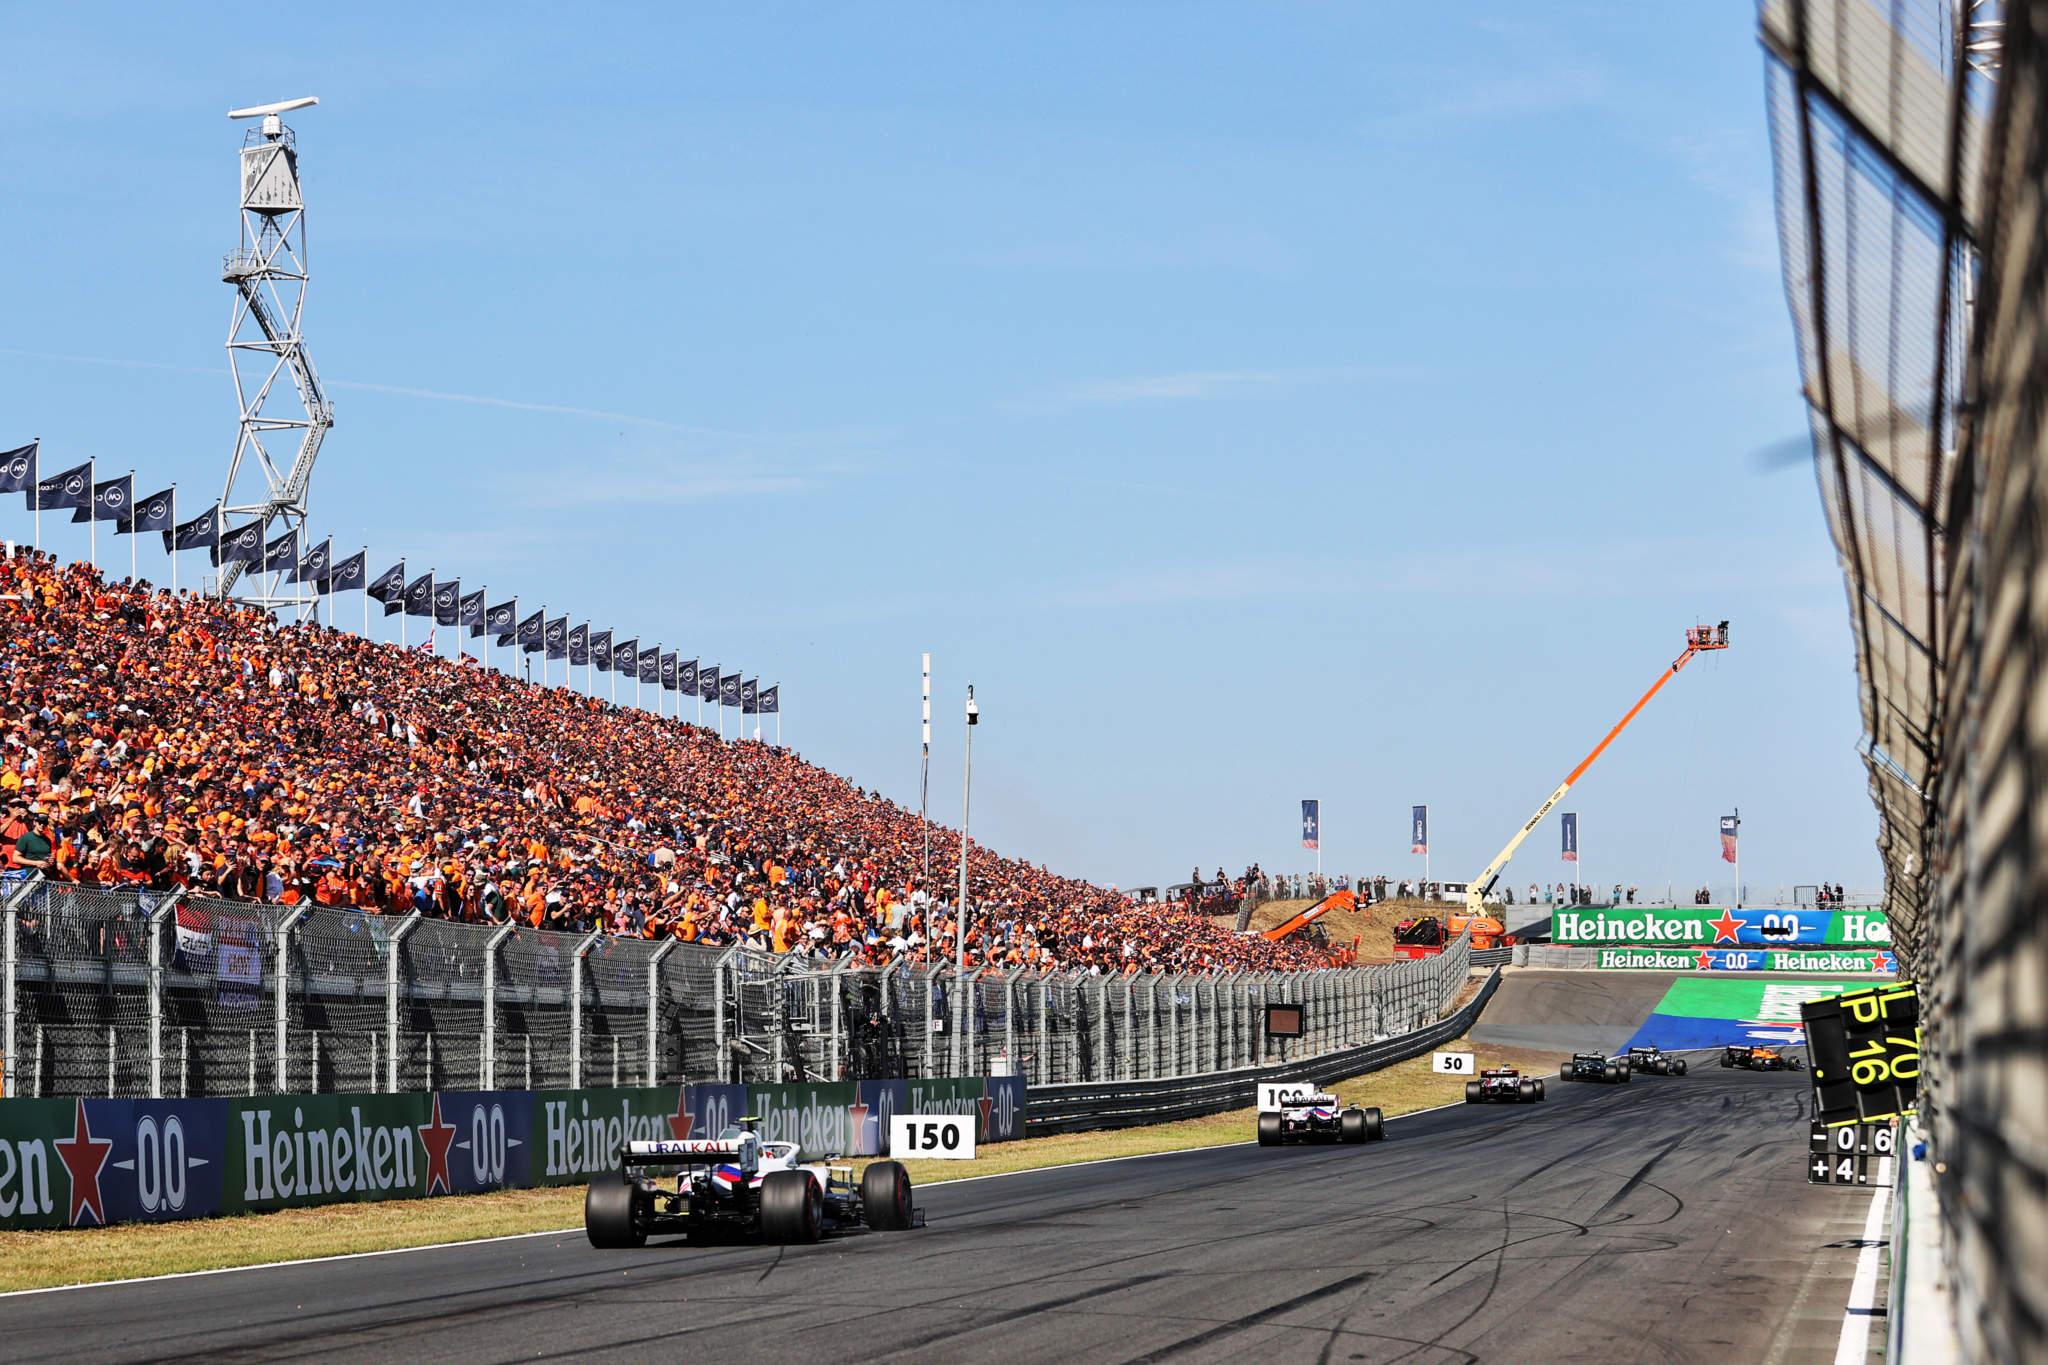 Motor Racing Formula One World Championship Dutch Grand Prix Race Day Zandvoort, Netherlands